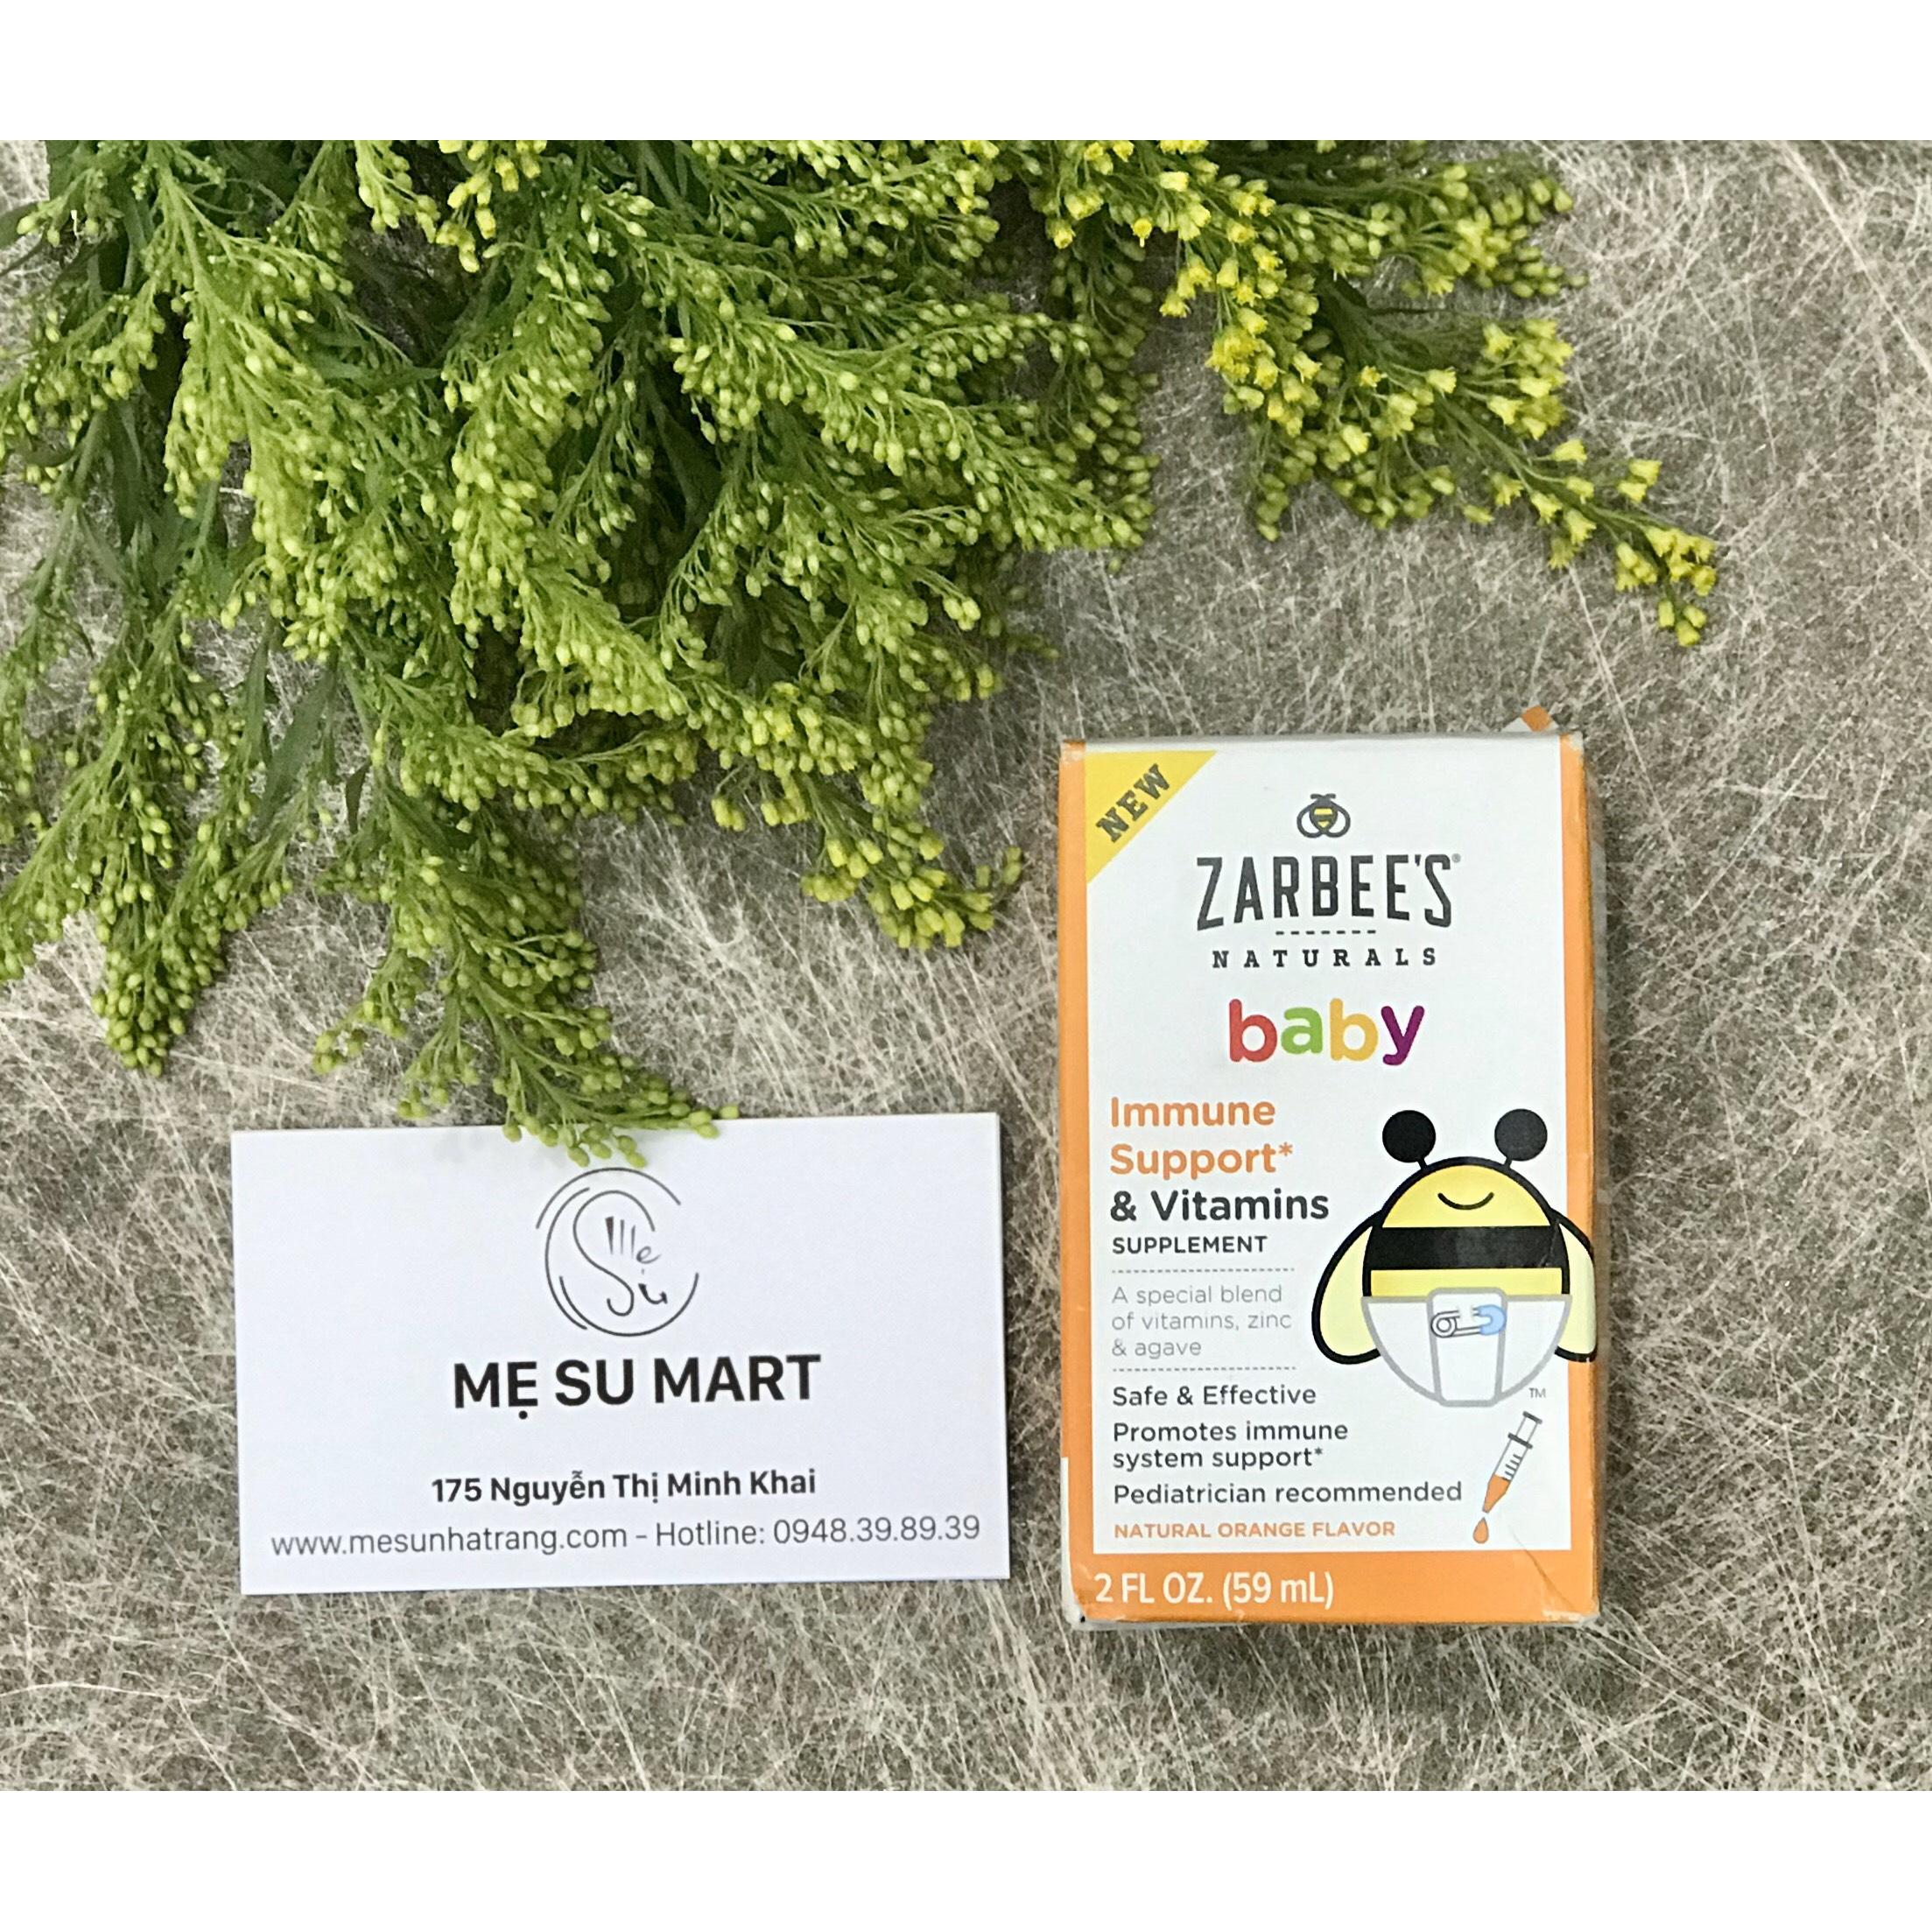 Zarbee's Naturals Baby Immune Support & Vitamins